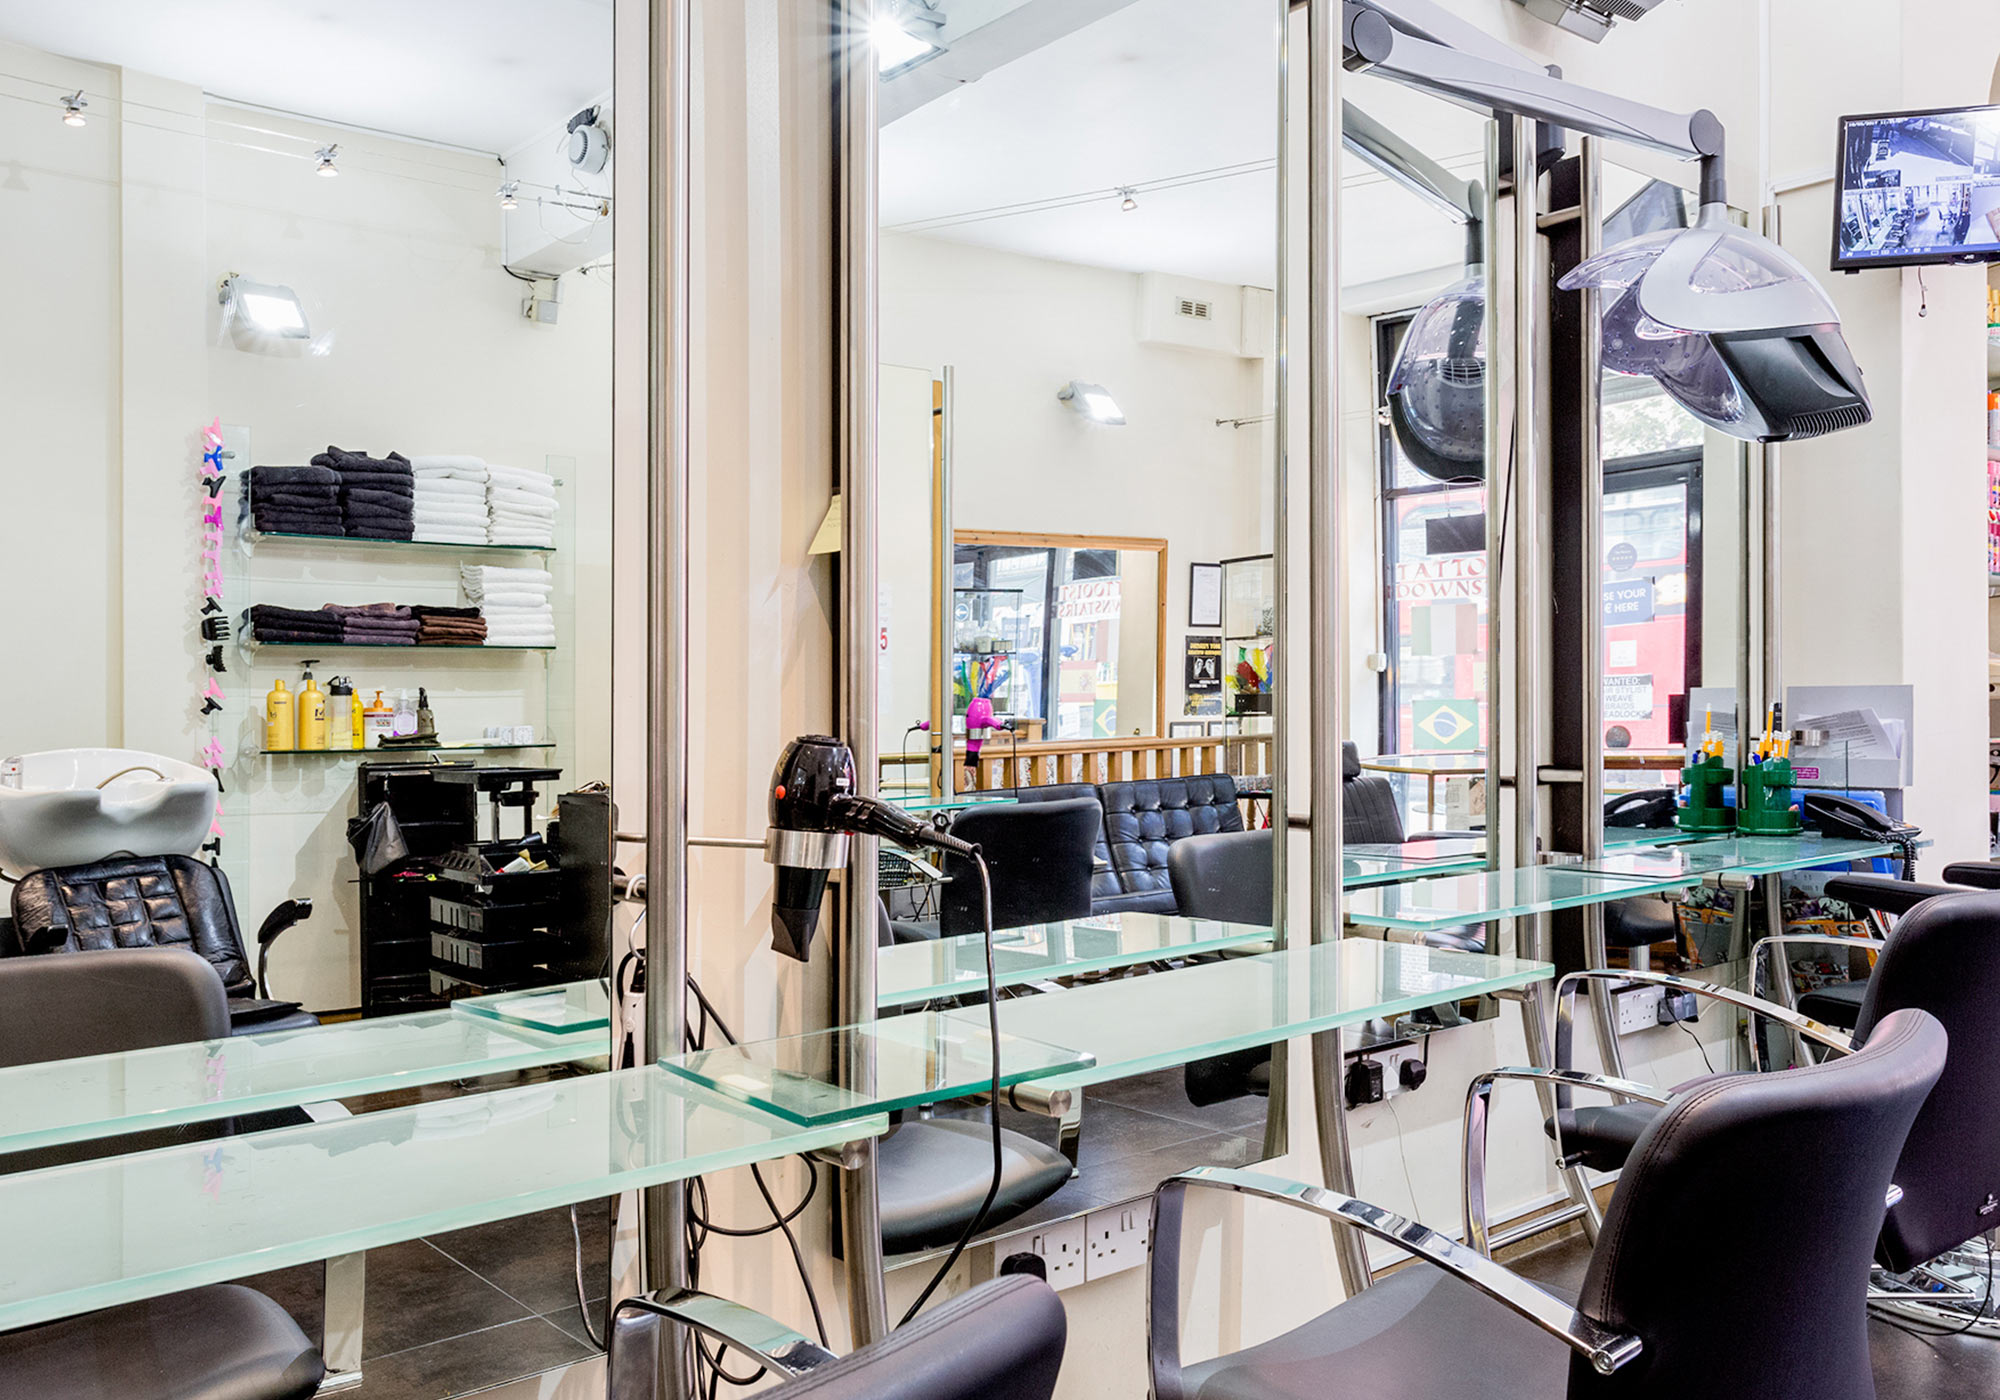 camden-locks-hair-studio-stylist-chairs-close-up